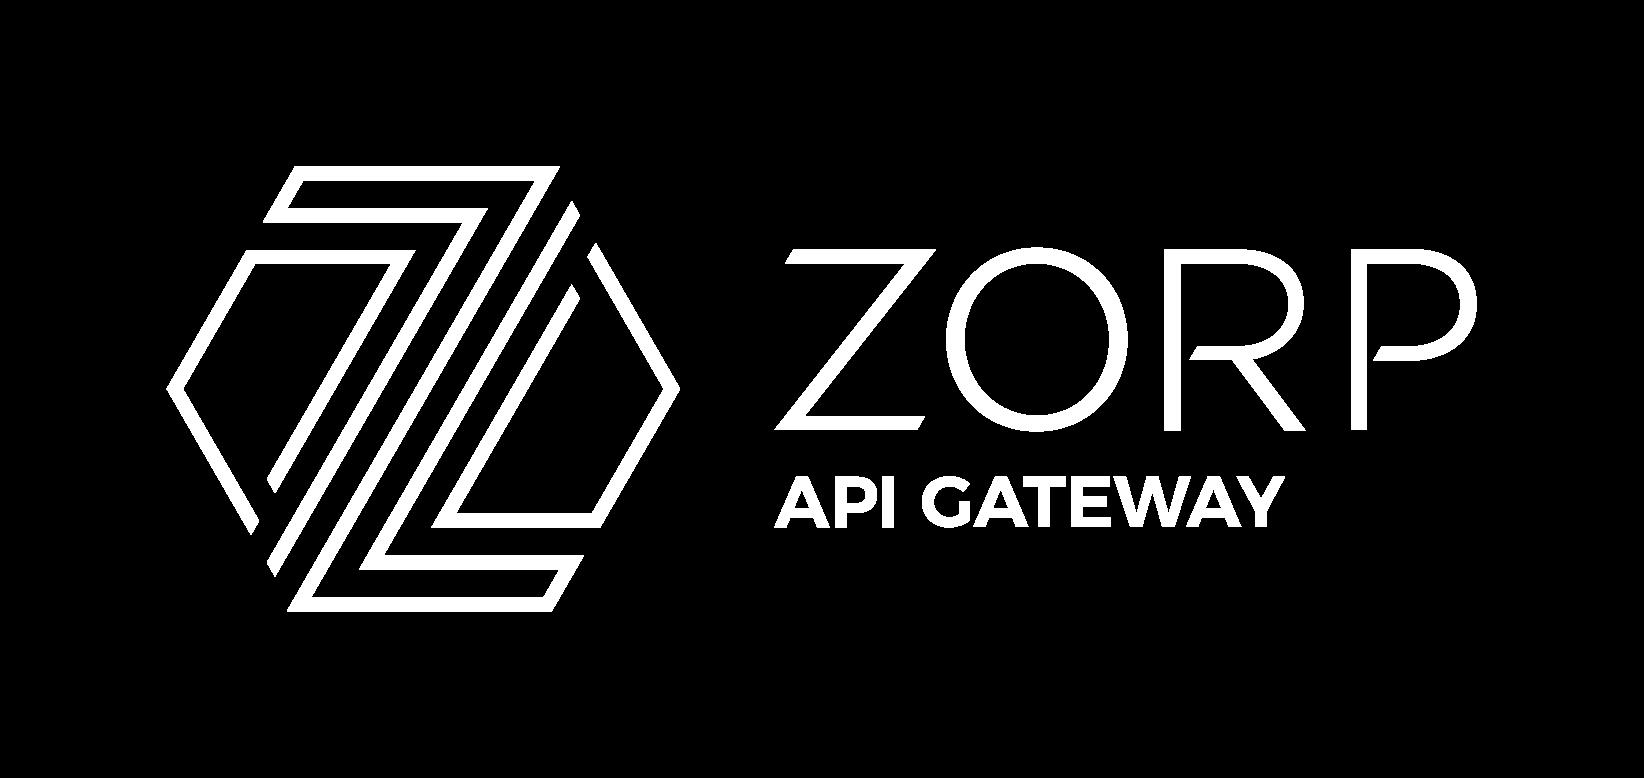 zorp api gateway logo